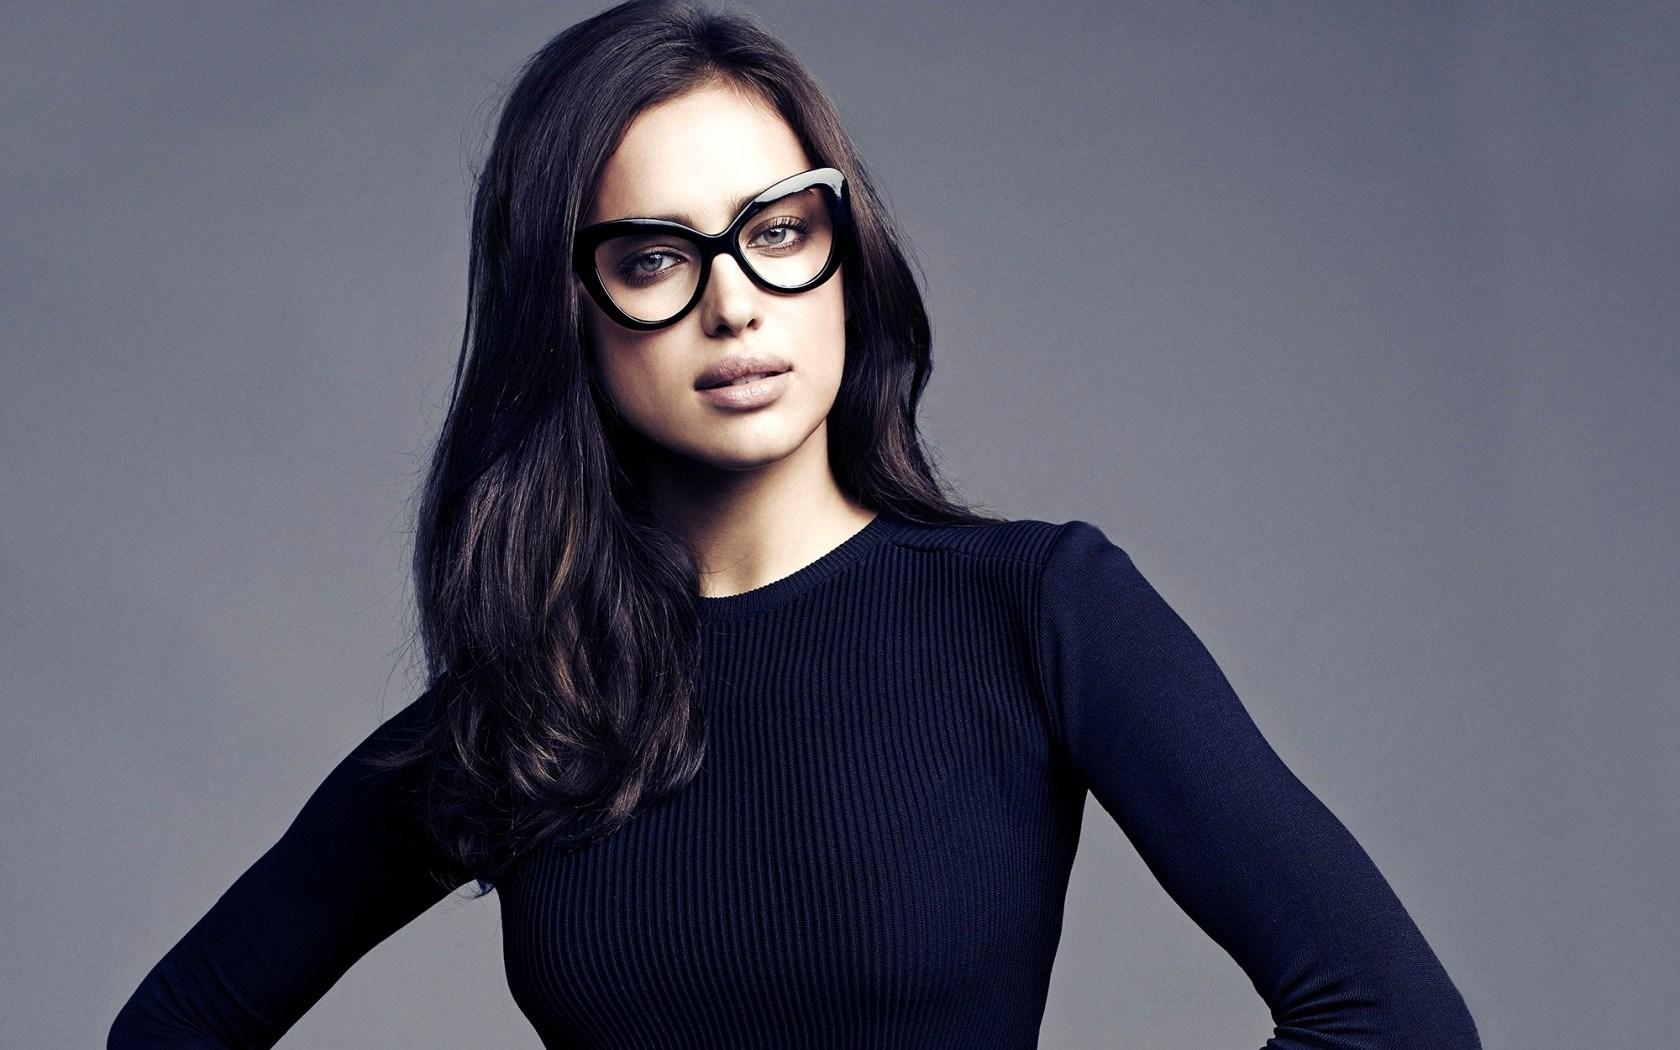 ba9091219 Model Irina Shayk in black dress and glasses with long dark hair.